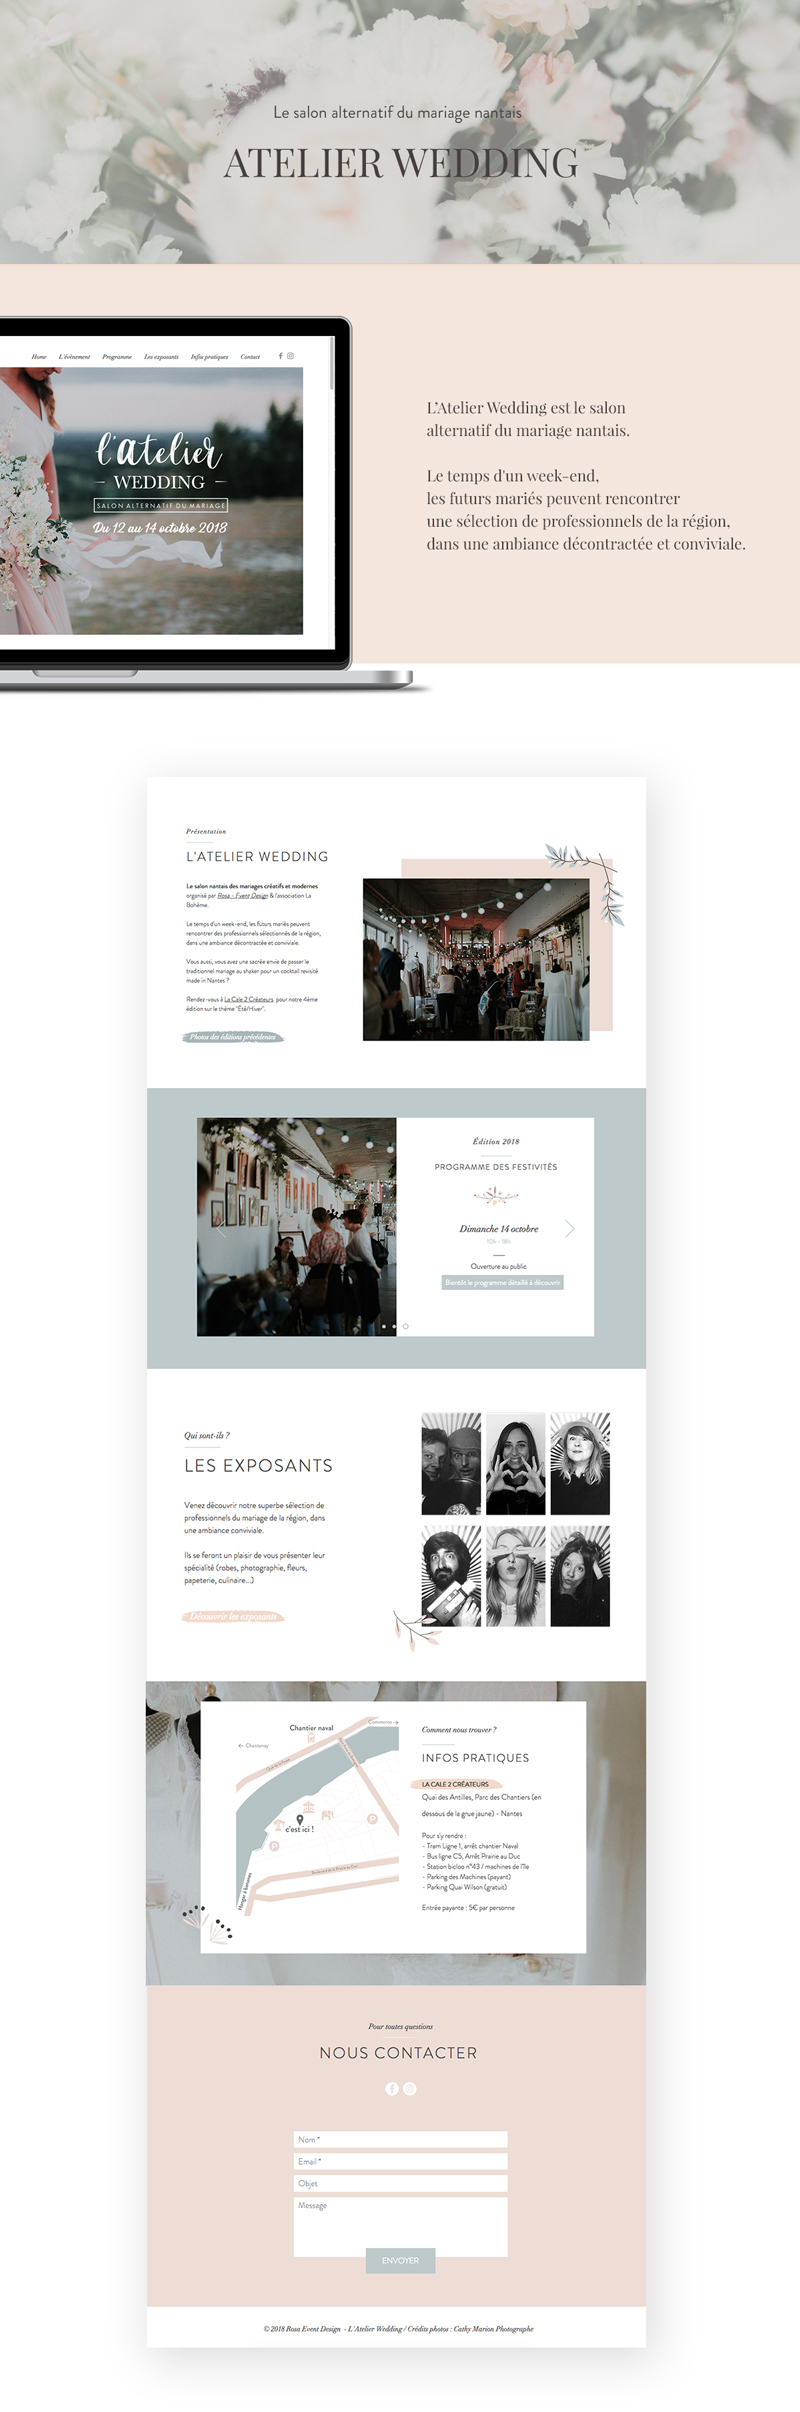 Atelier wedding présentation